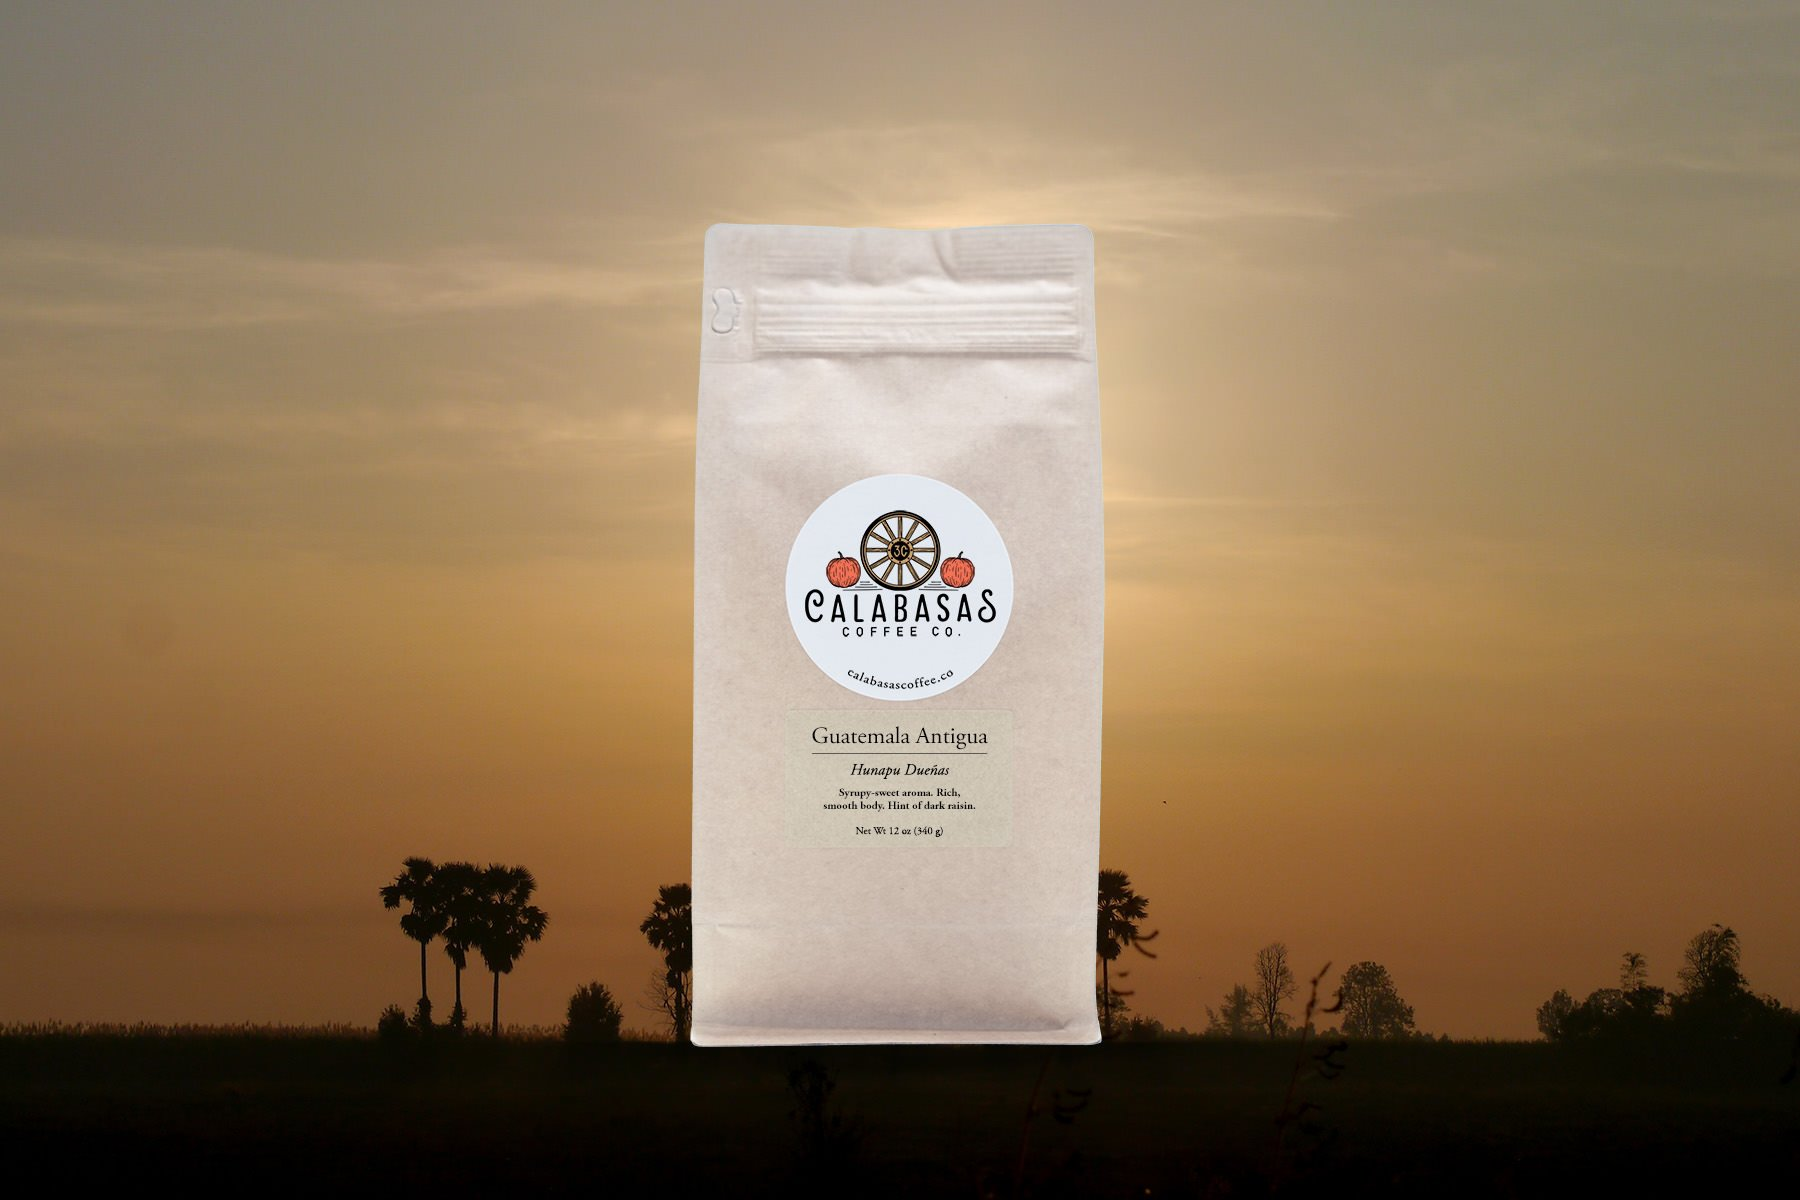 Calabasas-Coffee-Guatemala-Antigua-Hunapu-Duenas.jpg